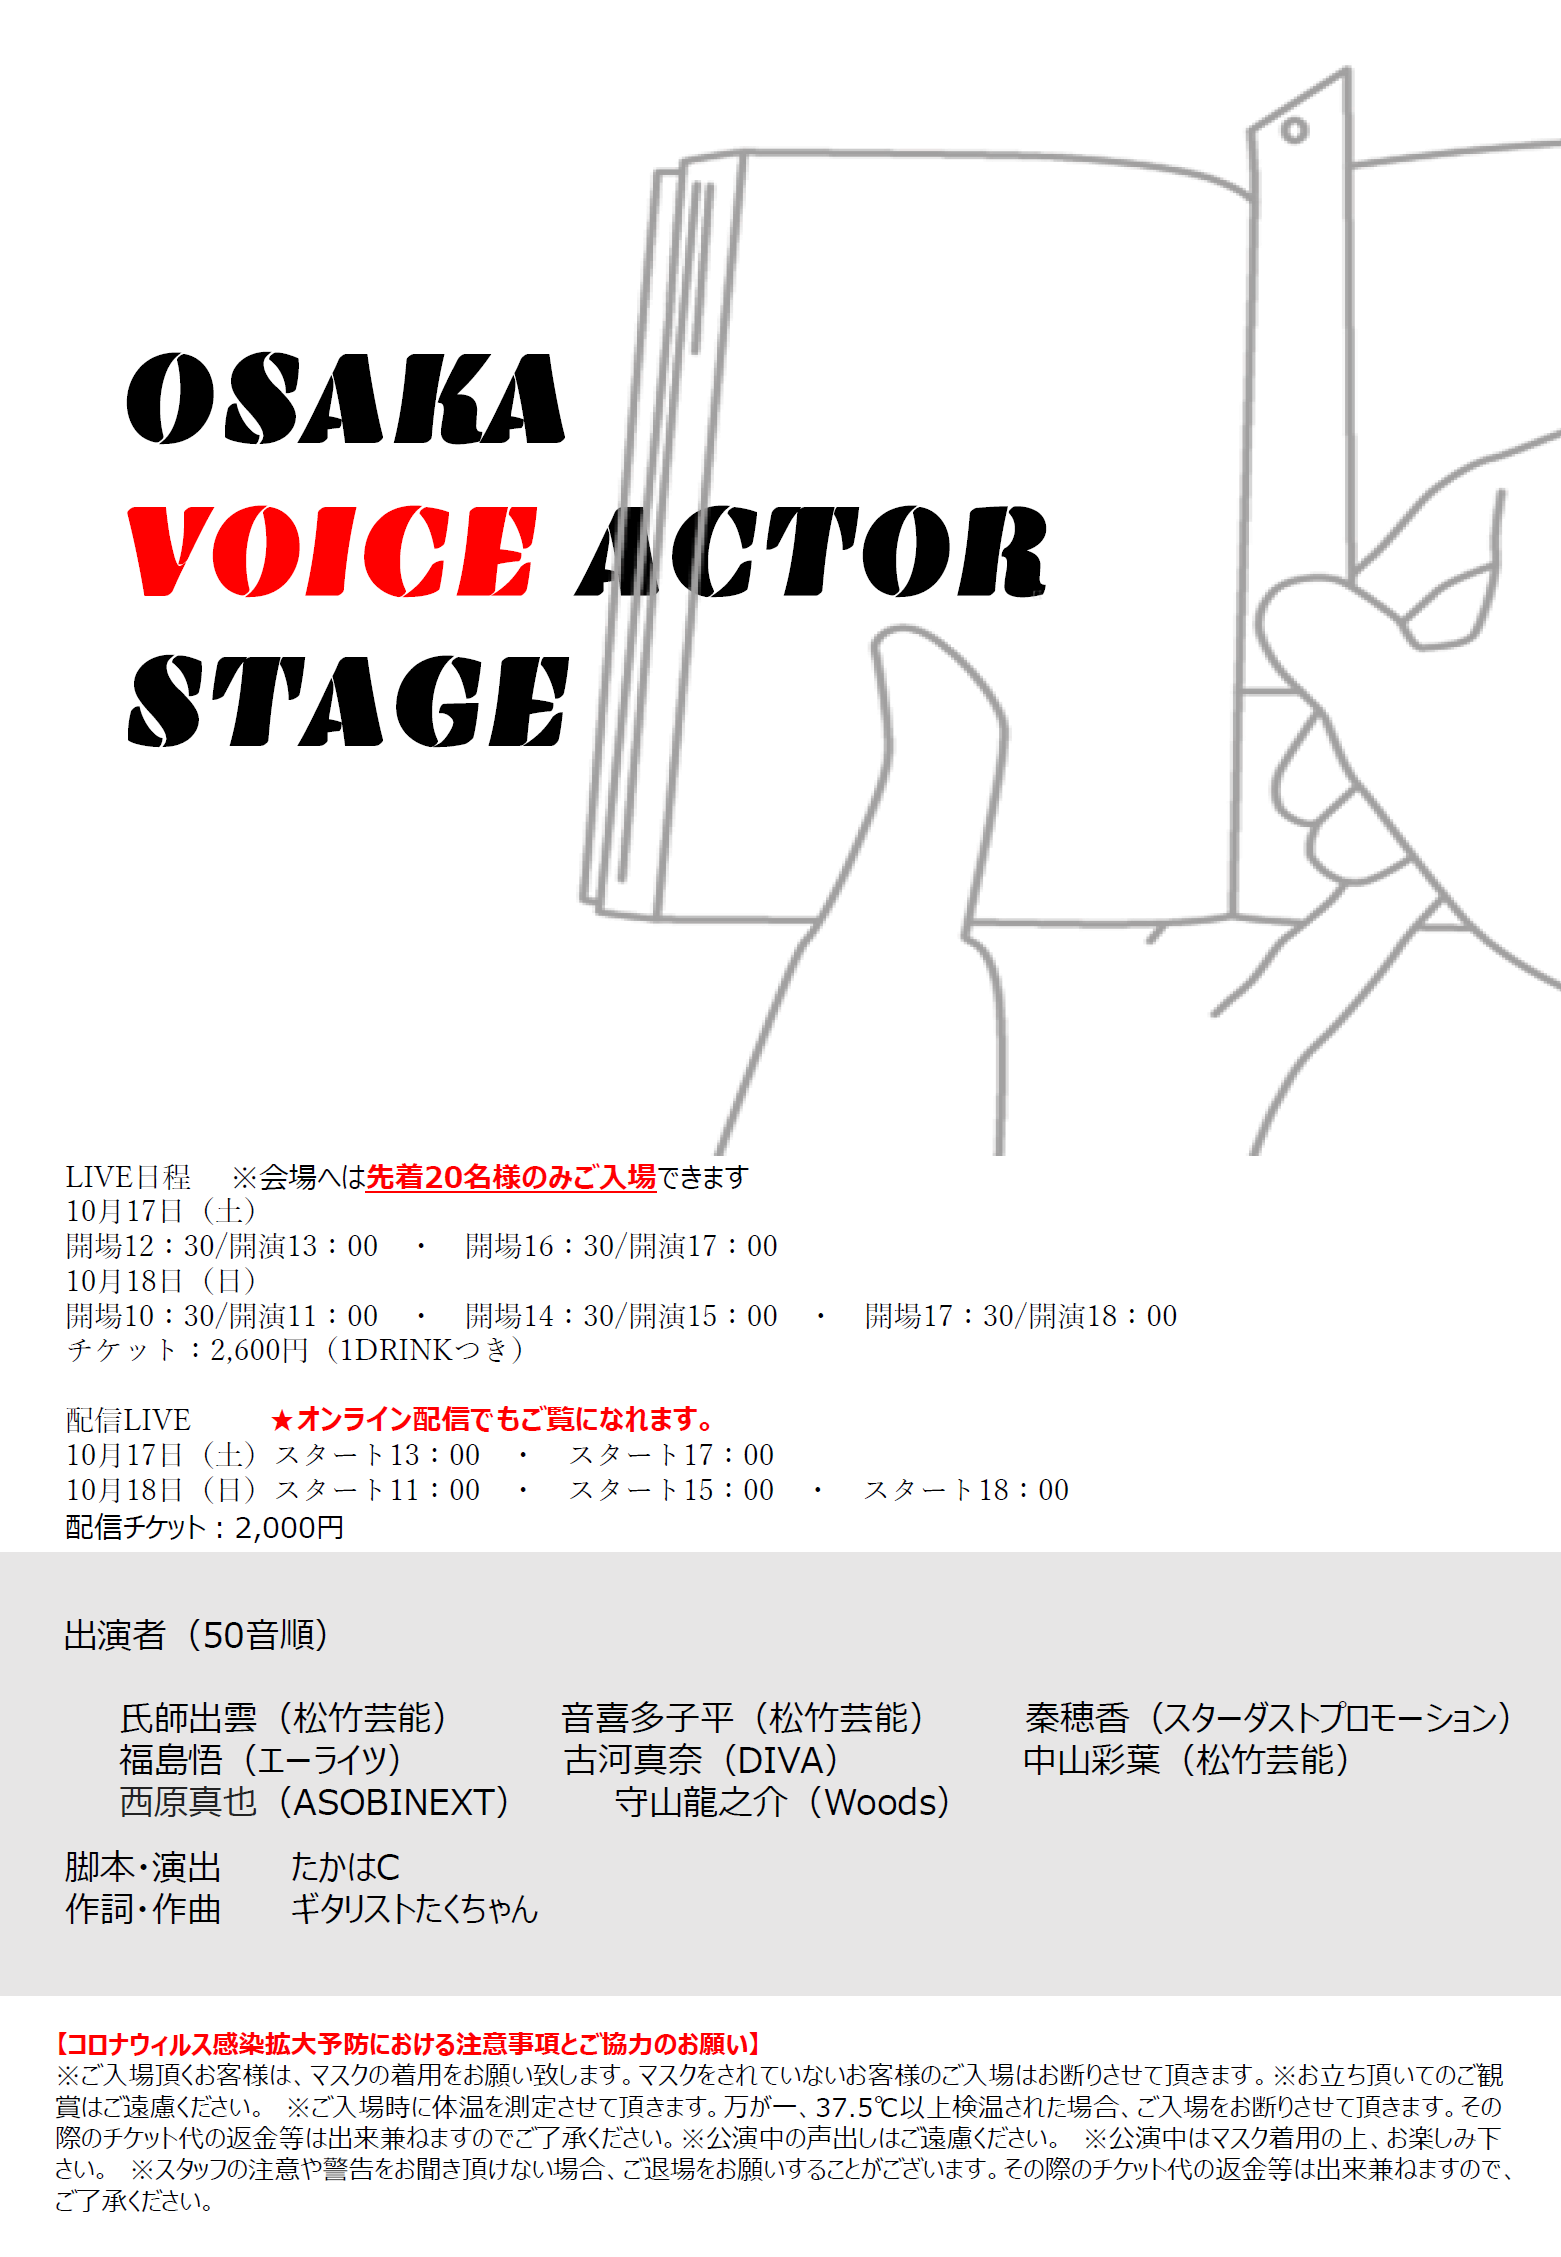 OSAKA VOICE ACTOR STAGE